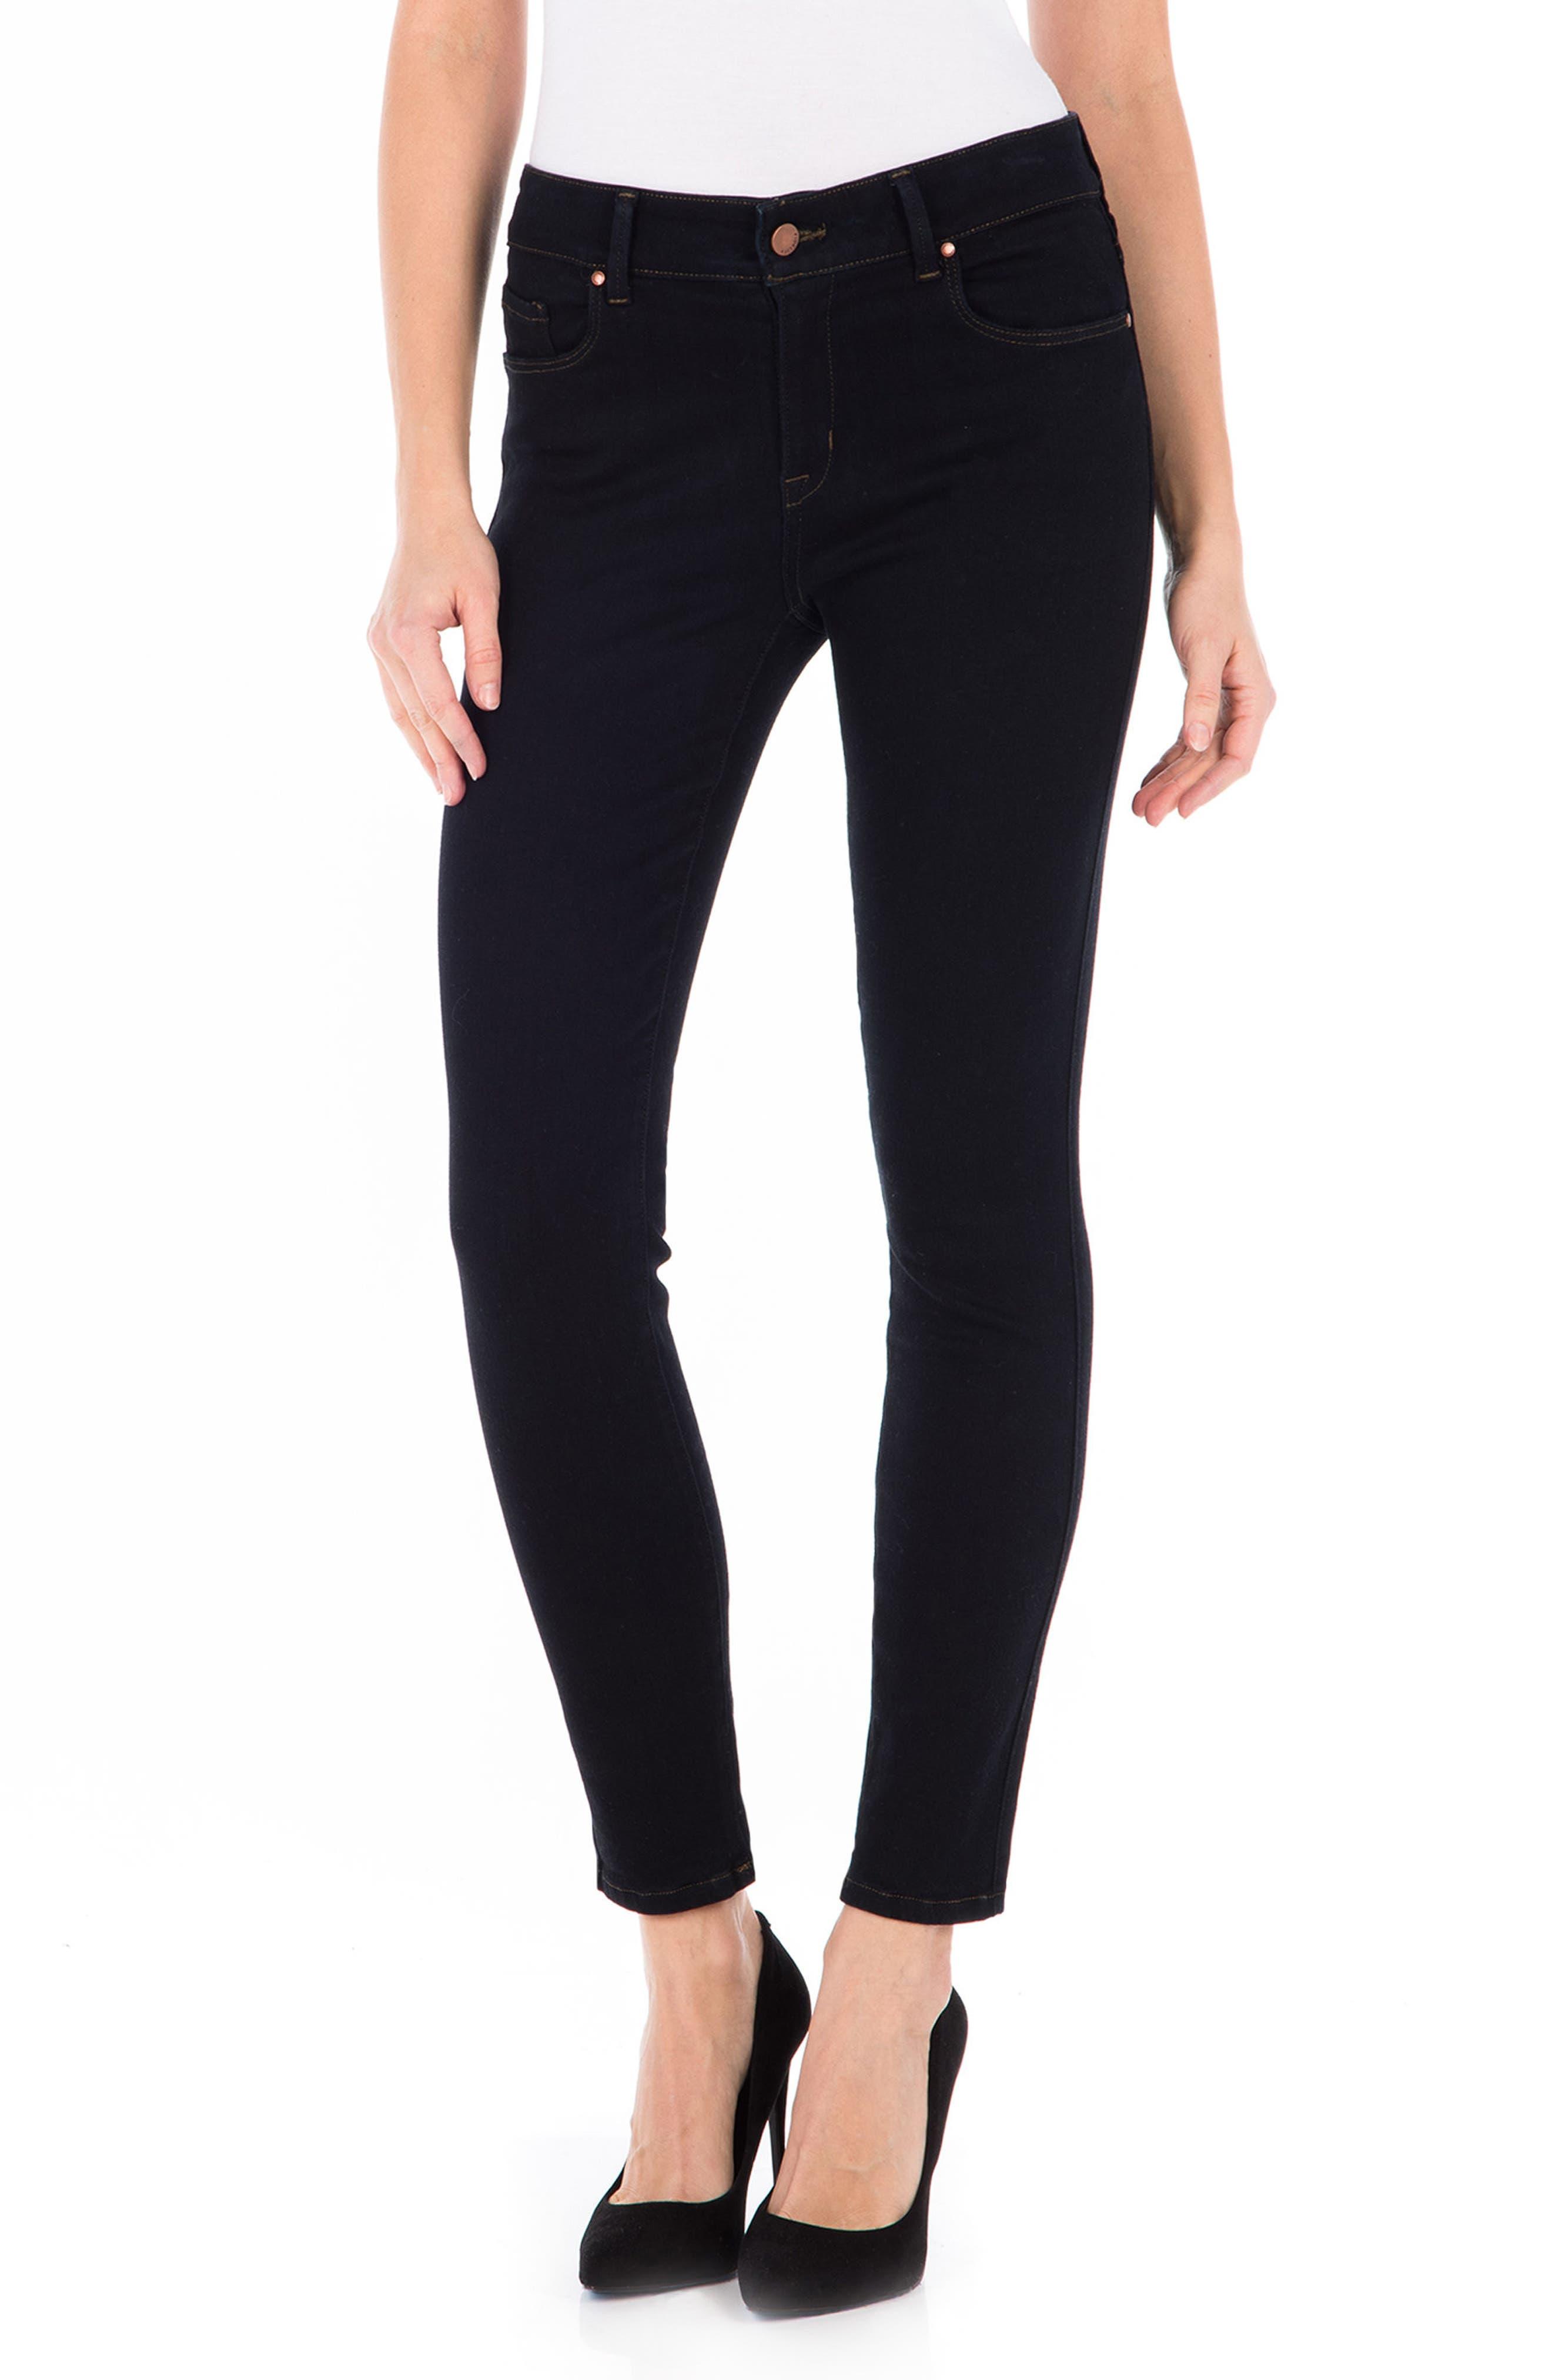 Sola Skinny Jeans,                         Main,                         color, Navy Noir